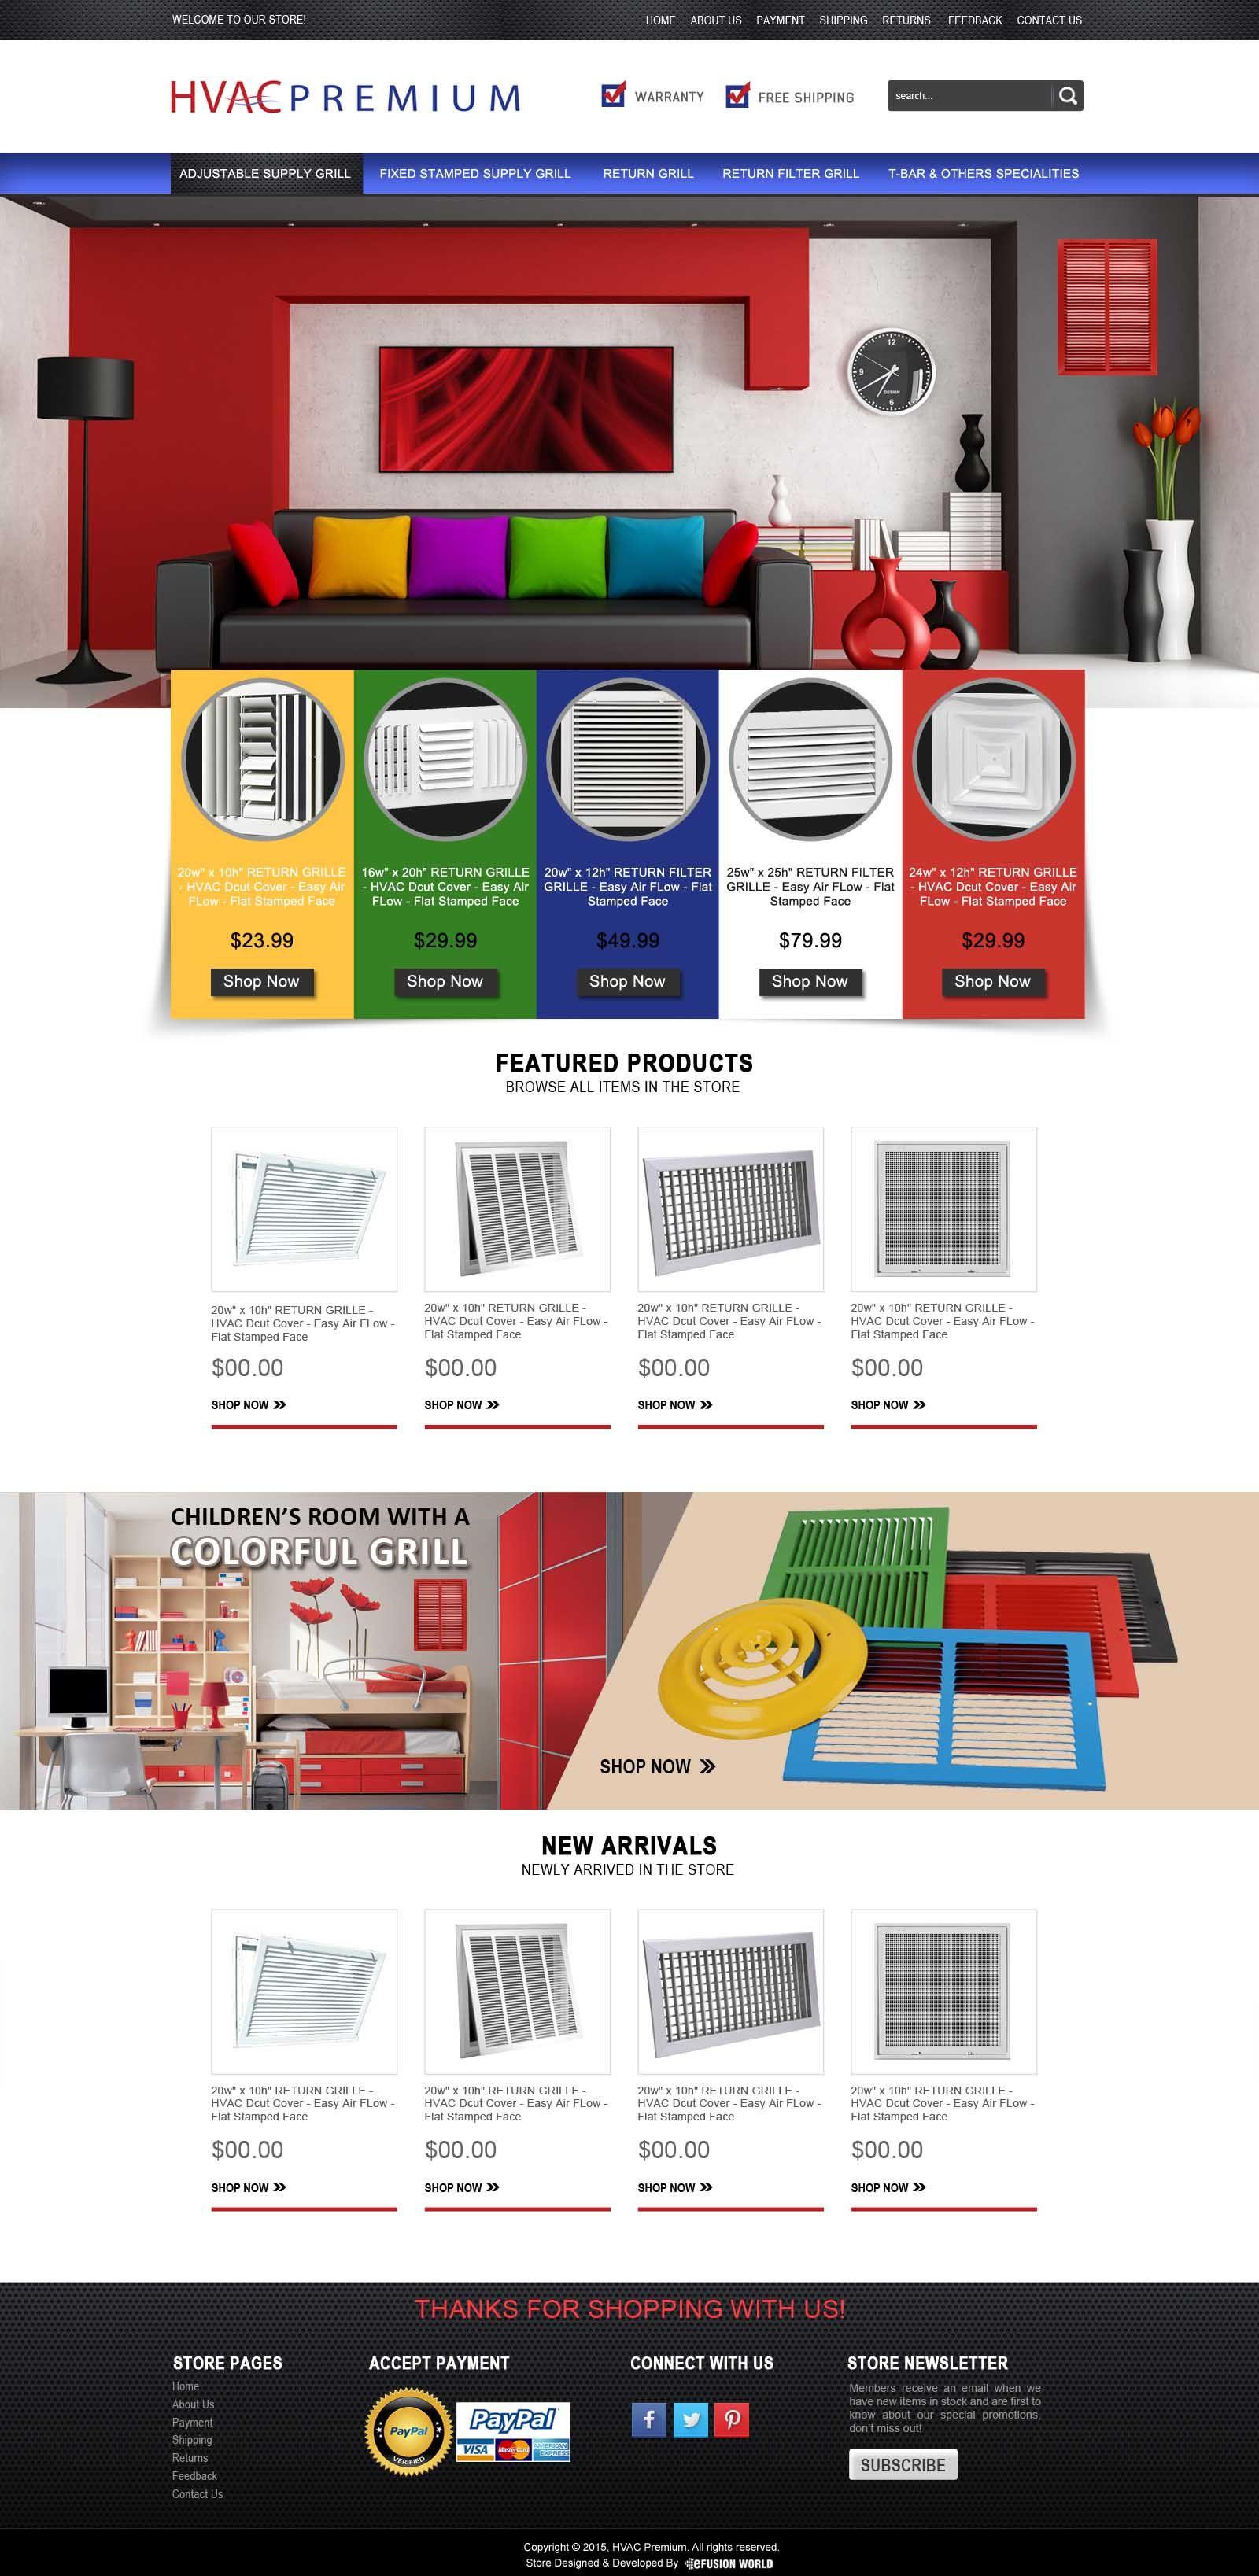 Ebay Store Design Service In 2020 Ebay Store Design Service Design Store Design